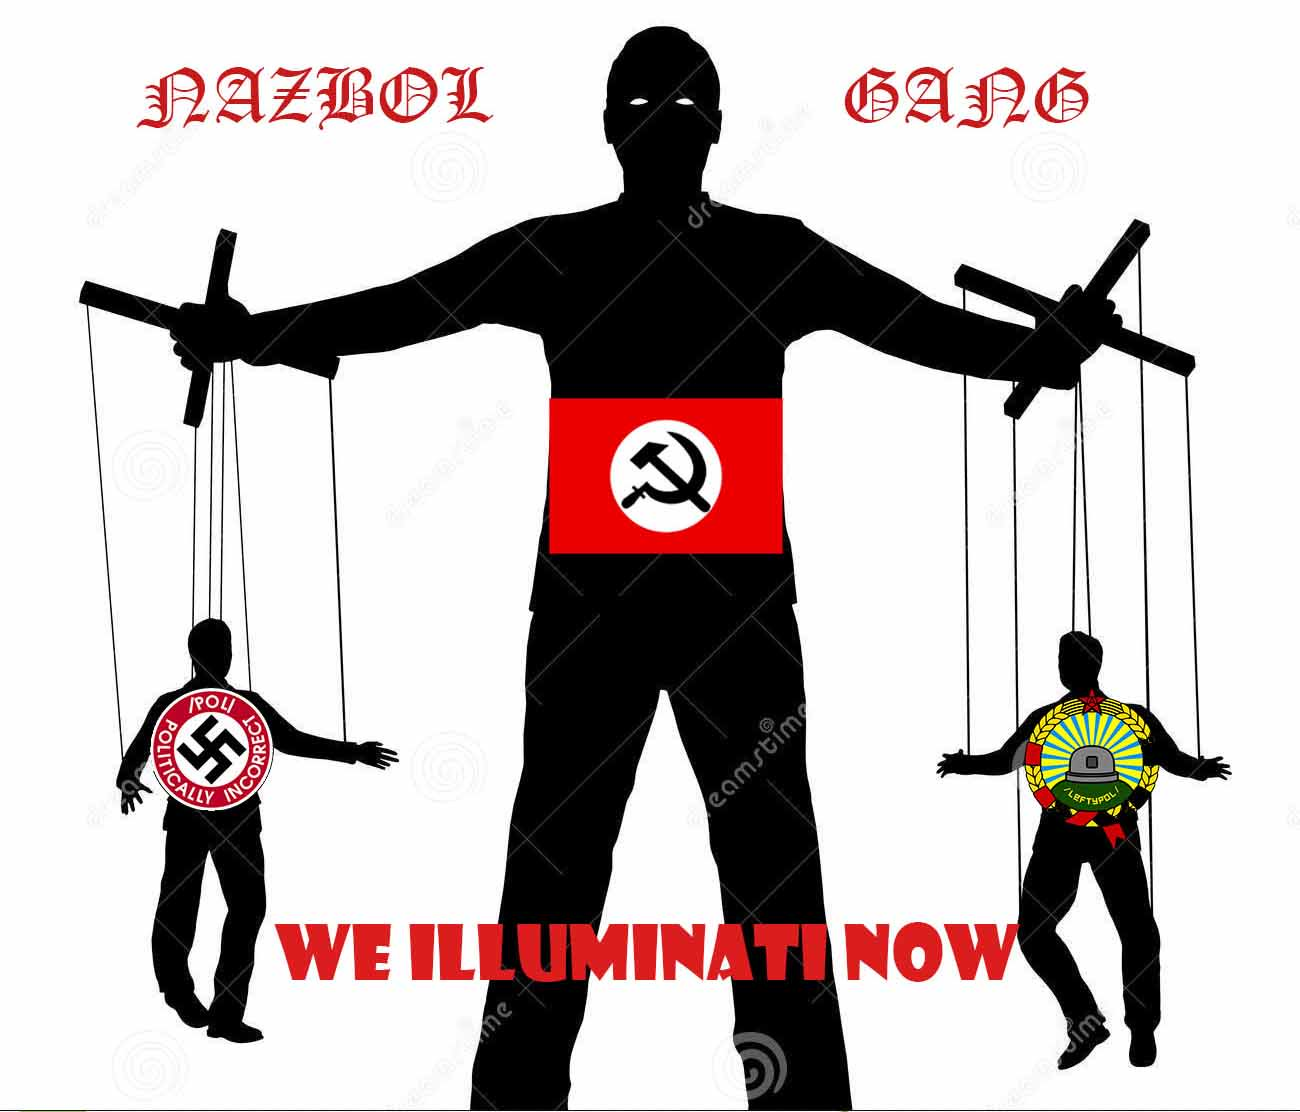 https://cdn.discordapp.com/attachments/360983468286410764/368122334537842689/Nazbol_illuminati.jpg